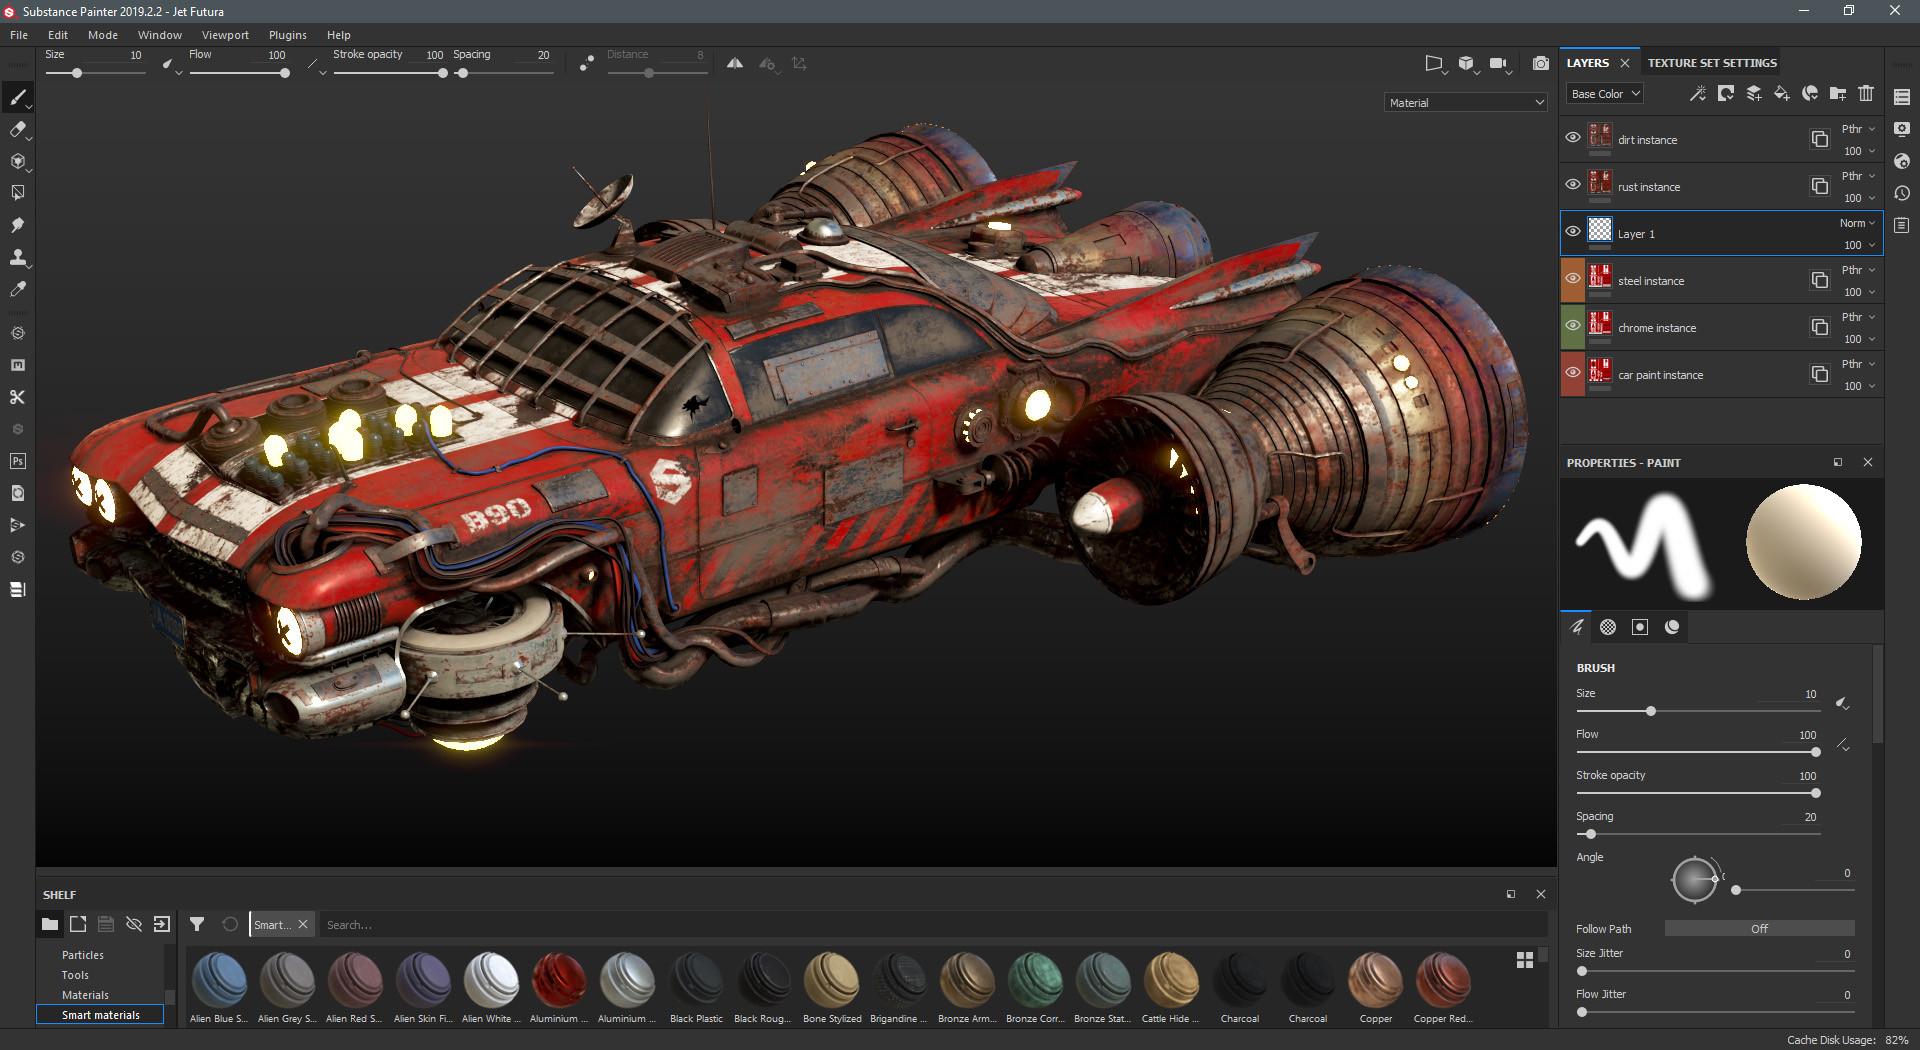 Substance Painter 2020 on Steam